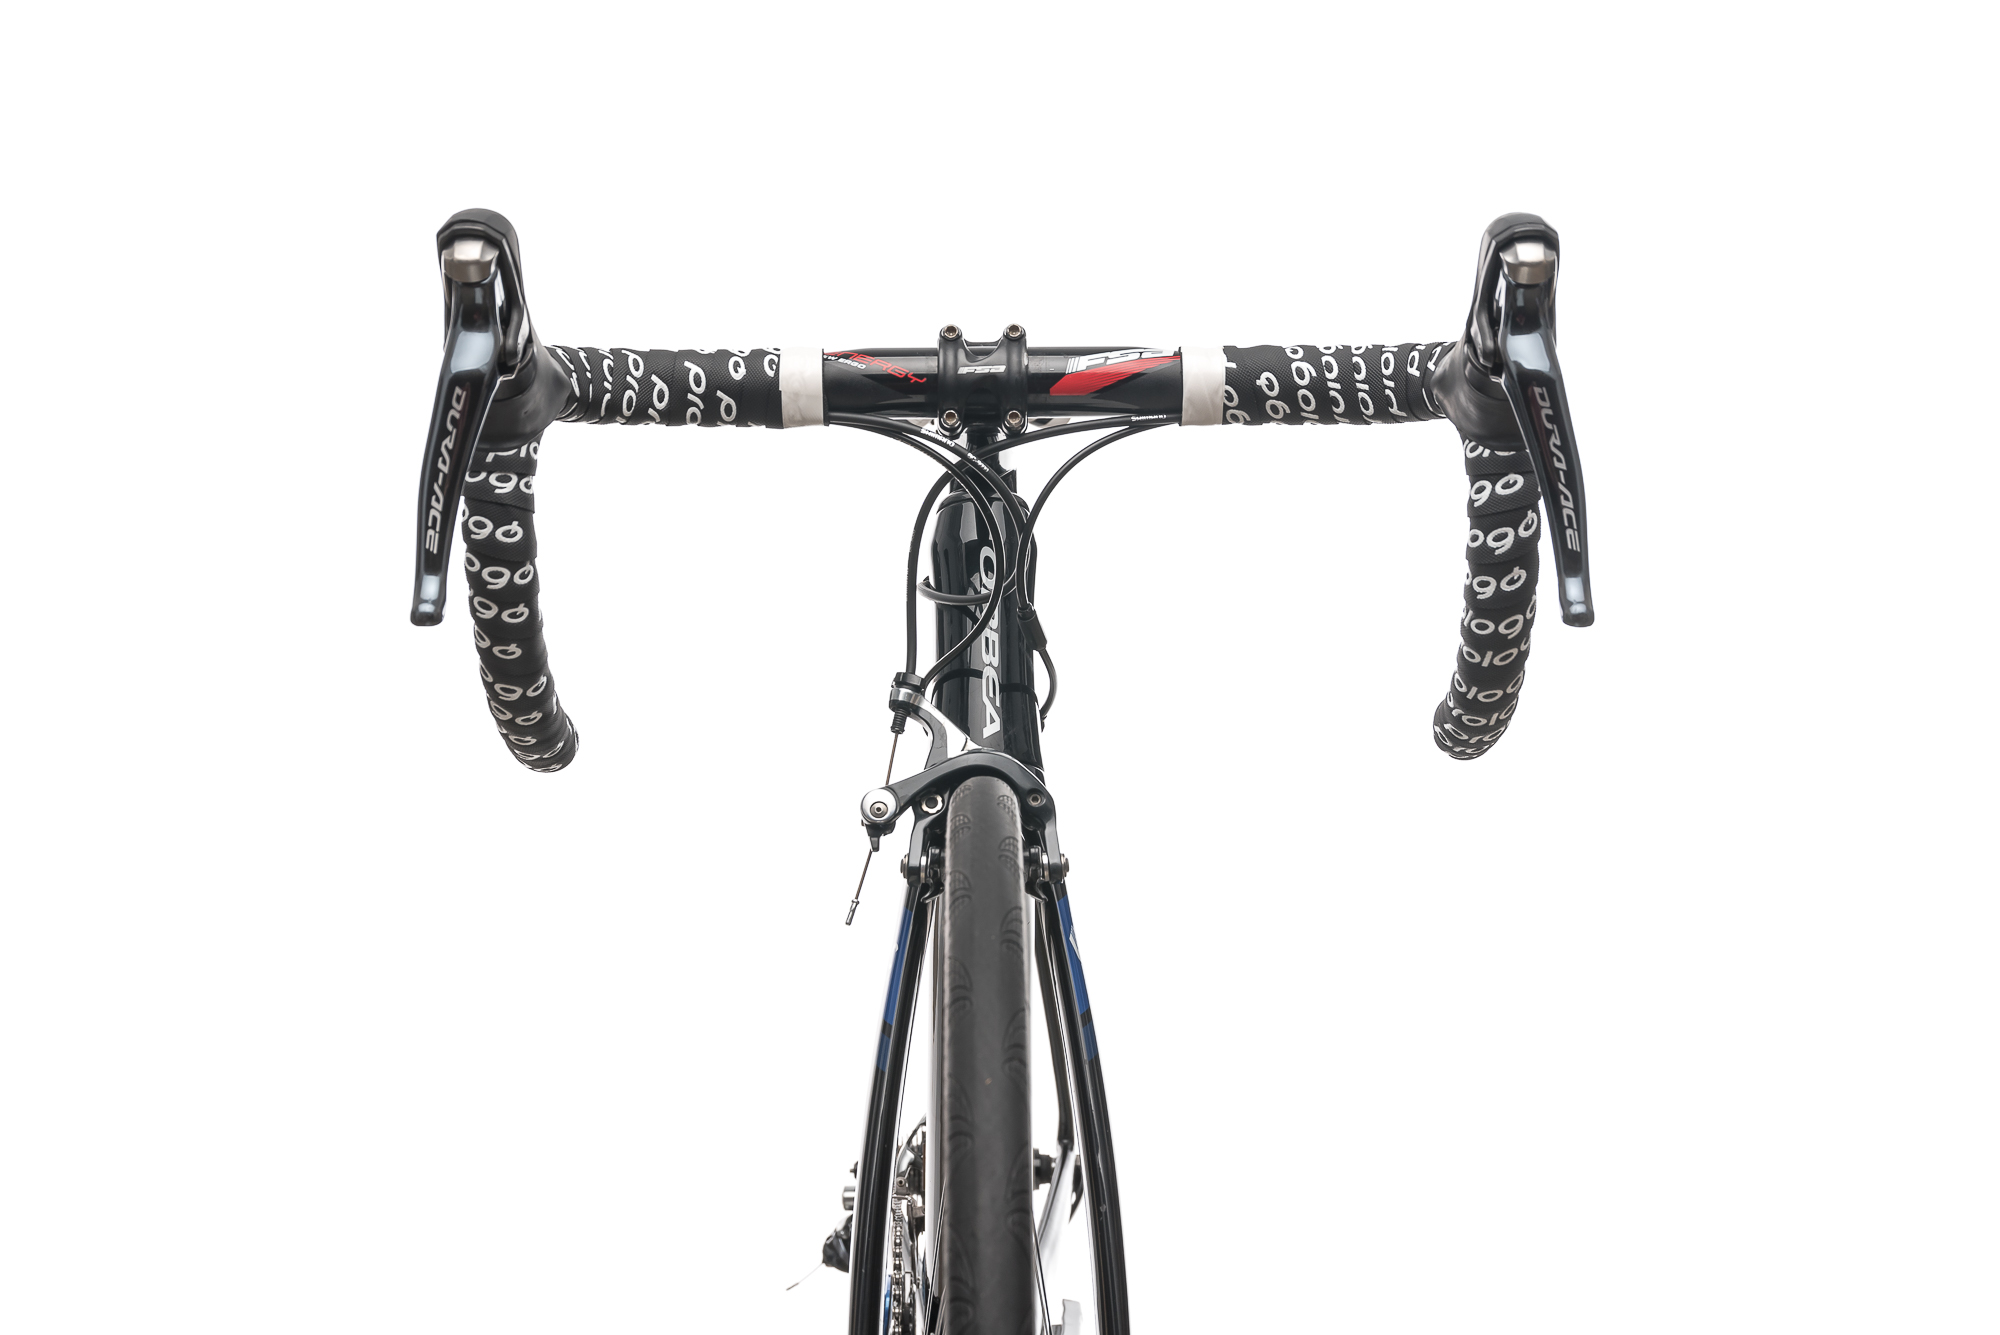 Orbea Orca M10 Uhc Team Road Bike 51cm Small Shimano